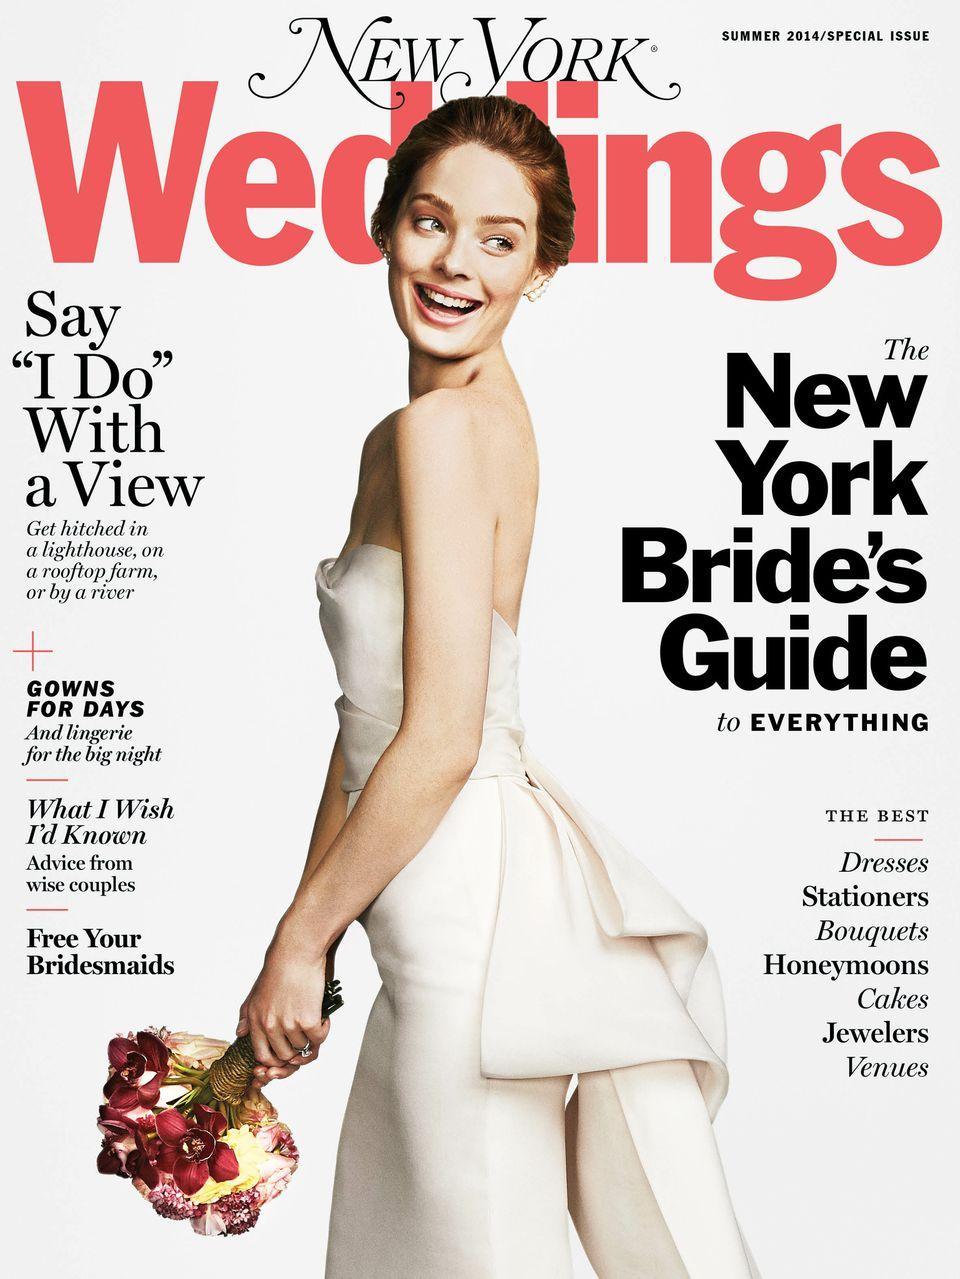 New York Weddings Magazine Summer 2014 Editorial List